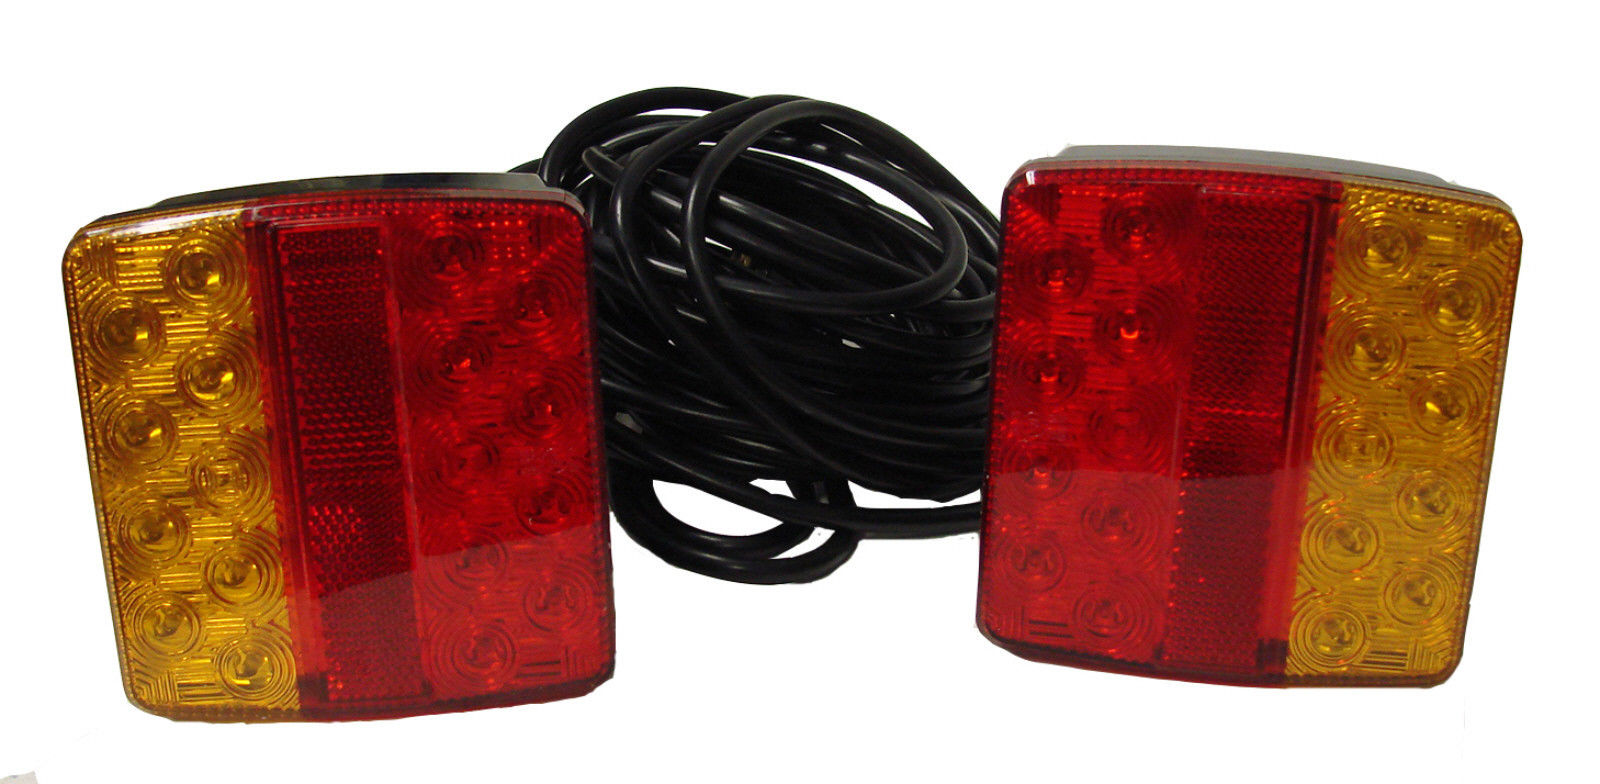 bottari-48040-kit-luces-traseras-para-remolque